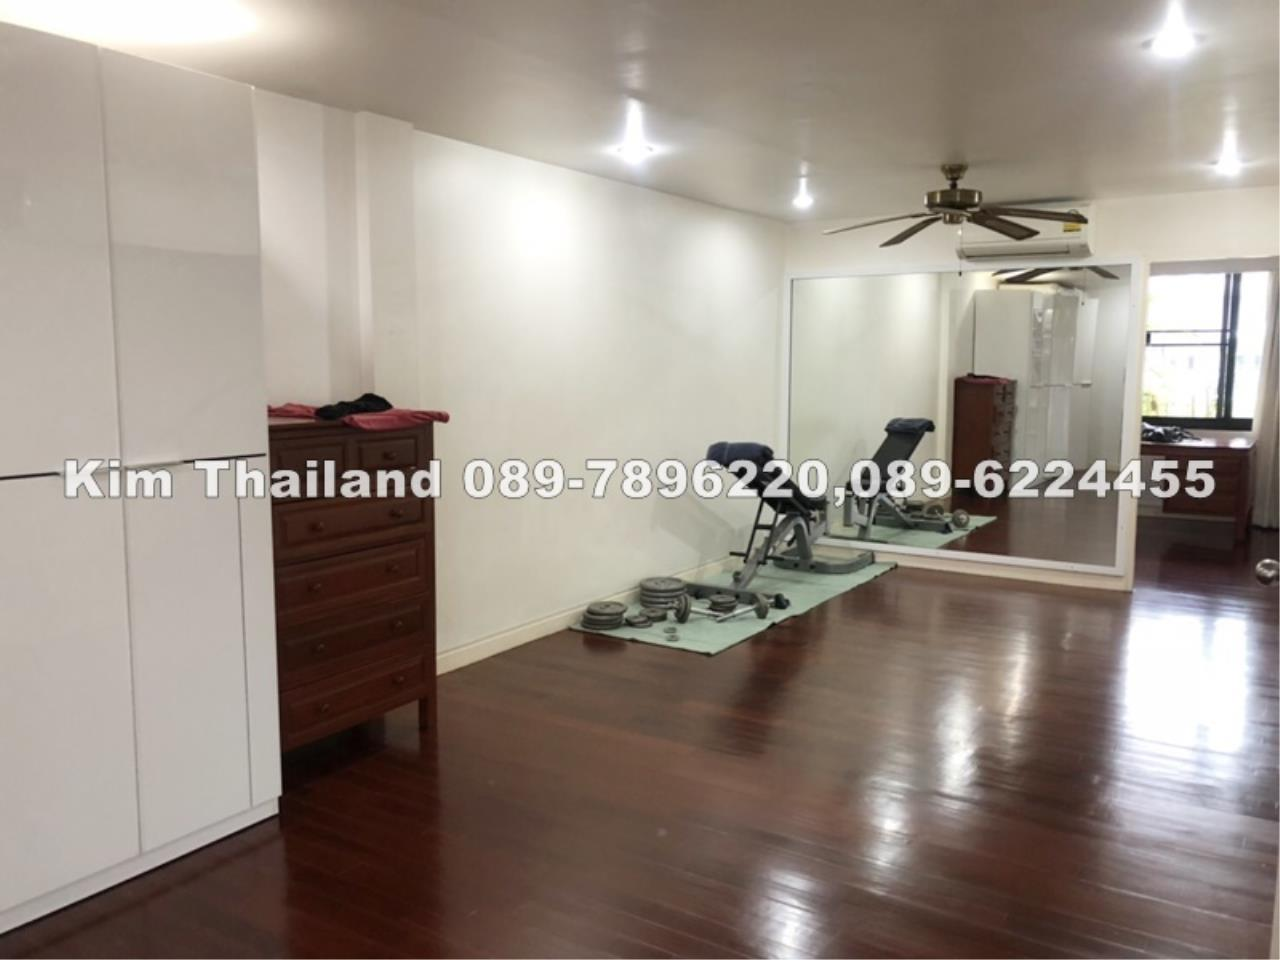 Kim Thailand Agency's ขายทาวน์เฮ้าส์ 4 ชั้น ย่านสุขุมวิท71 พื้นที่ 29.9 ตารางวา 4 ห้องนอน ขาย 15.7 ล้านบาท 5